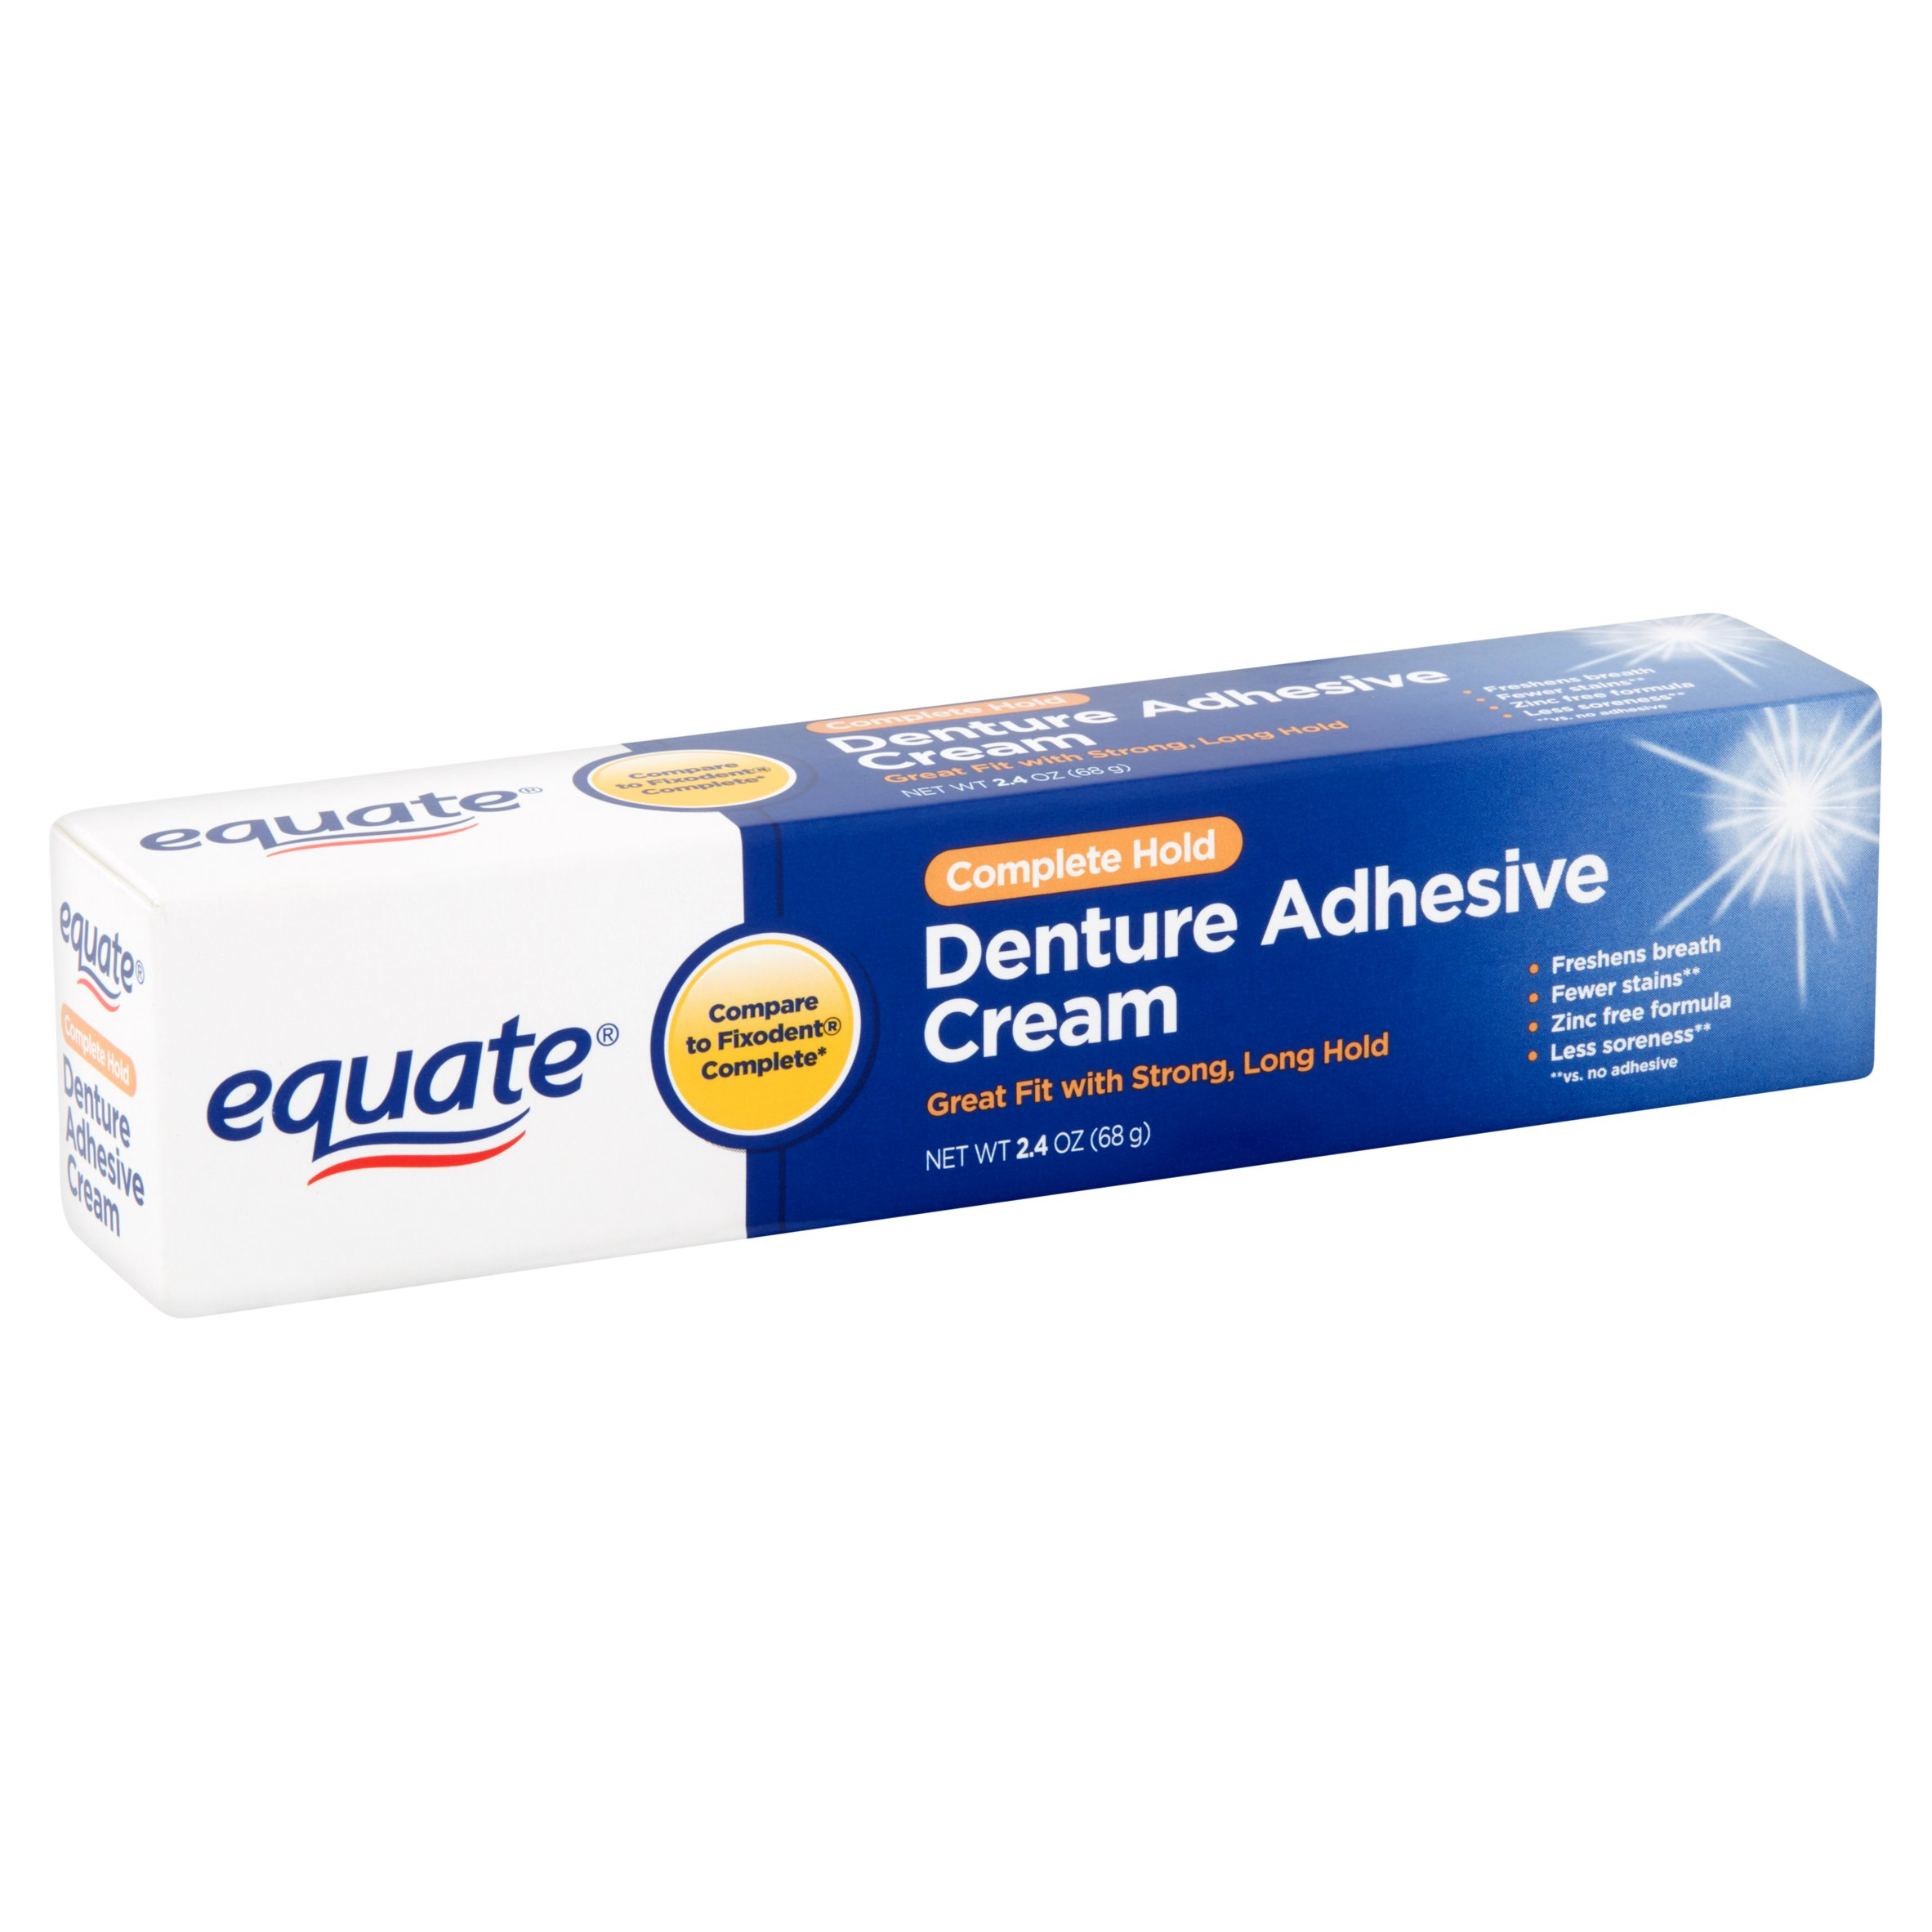 Cushion grip denture adhesive walmart - Equate Complete Hold Denture Adhesive Cream 2 4 Oz